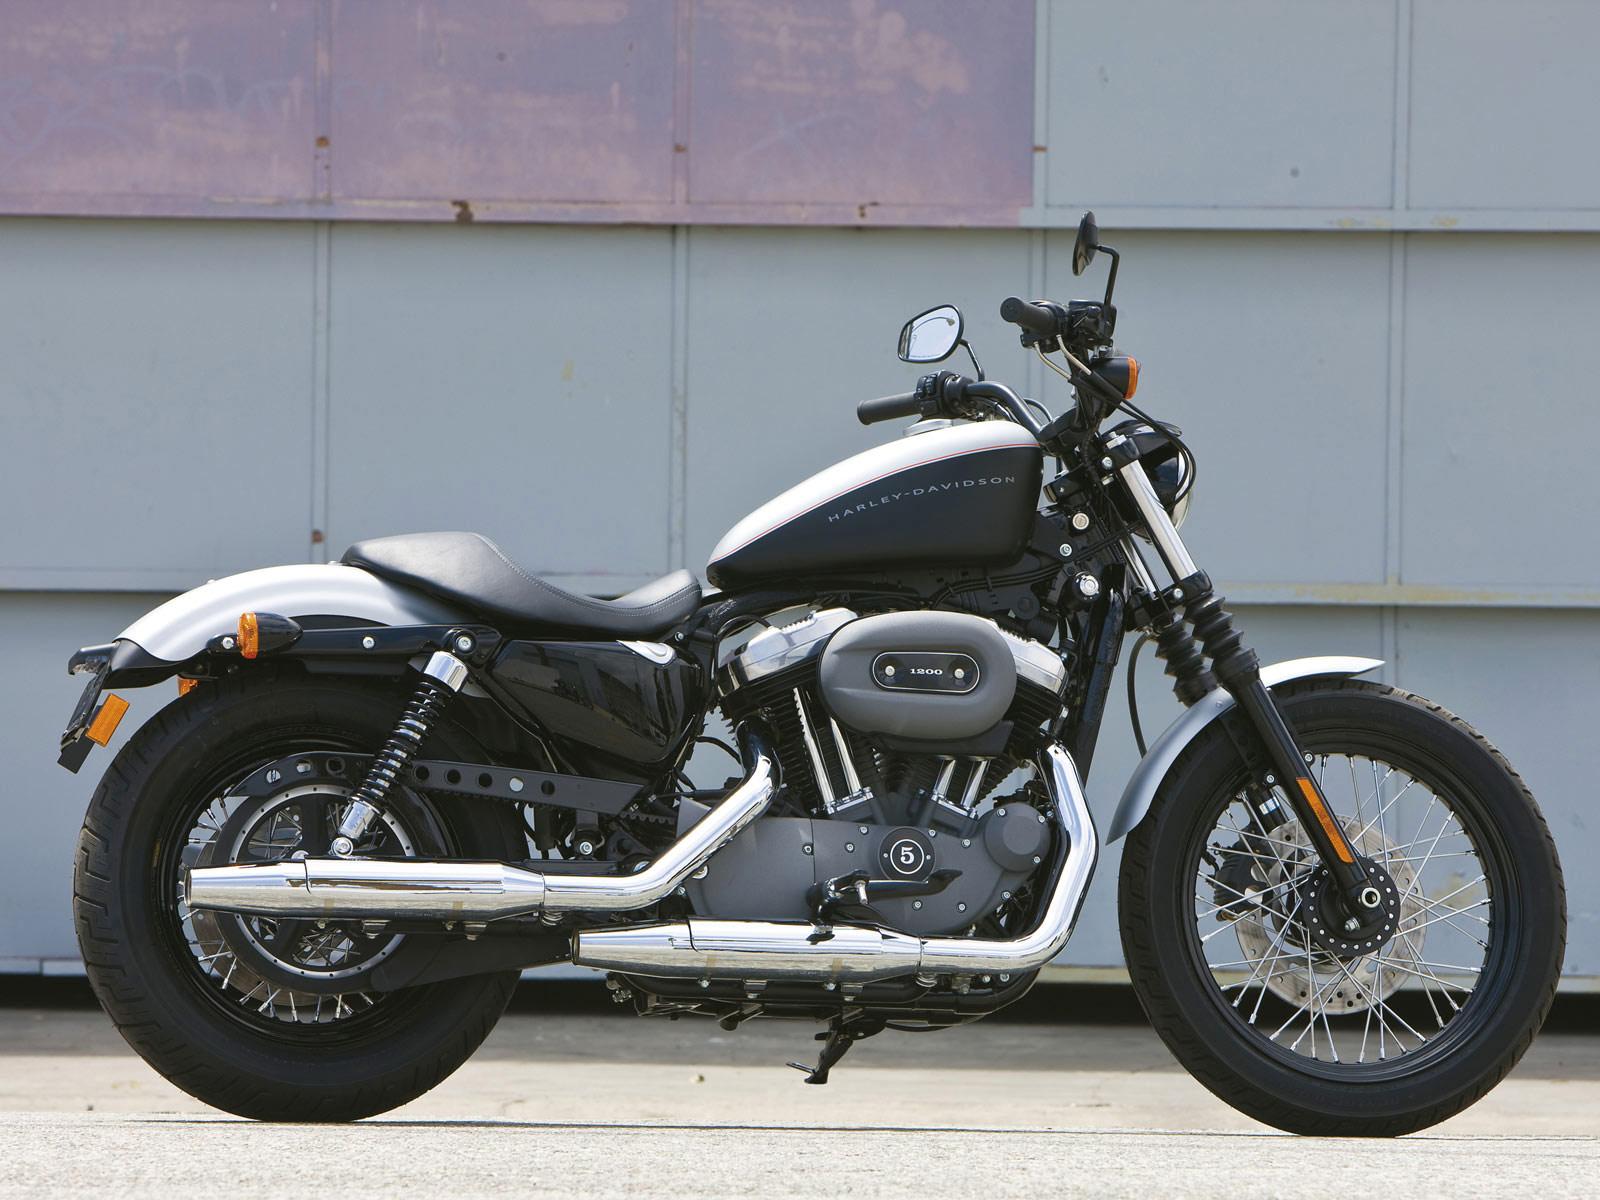 Xl 1200n Sportster 1200 Nightster 2009 Harley Davidson